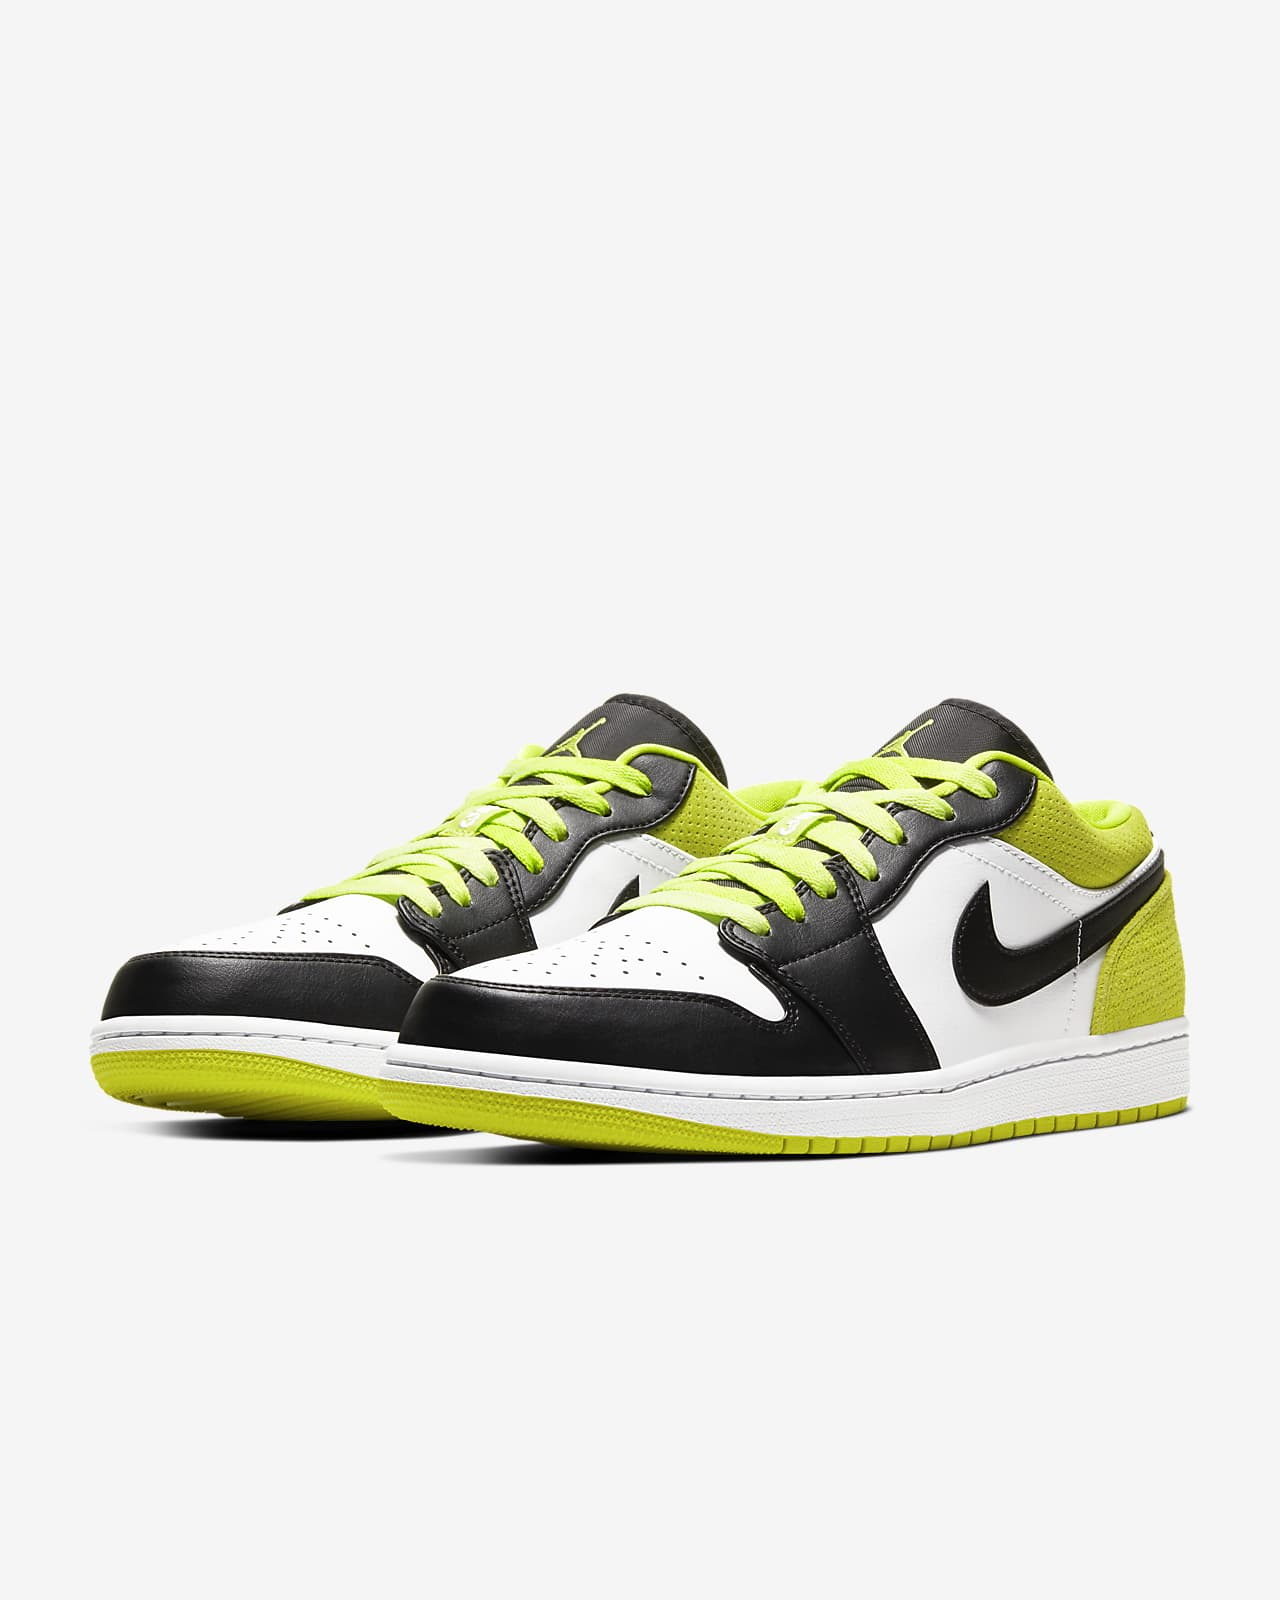 Air Jordan 1 Low SE Shoe. Nike SG